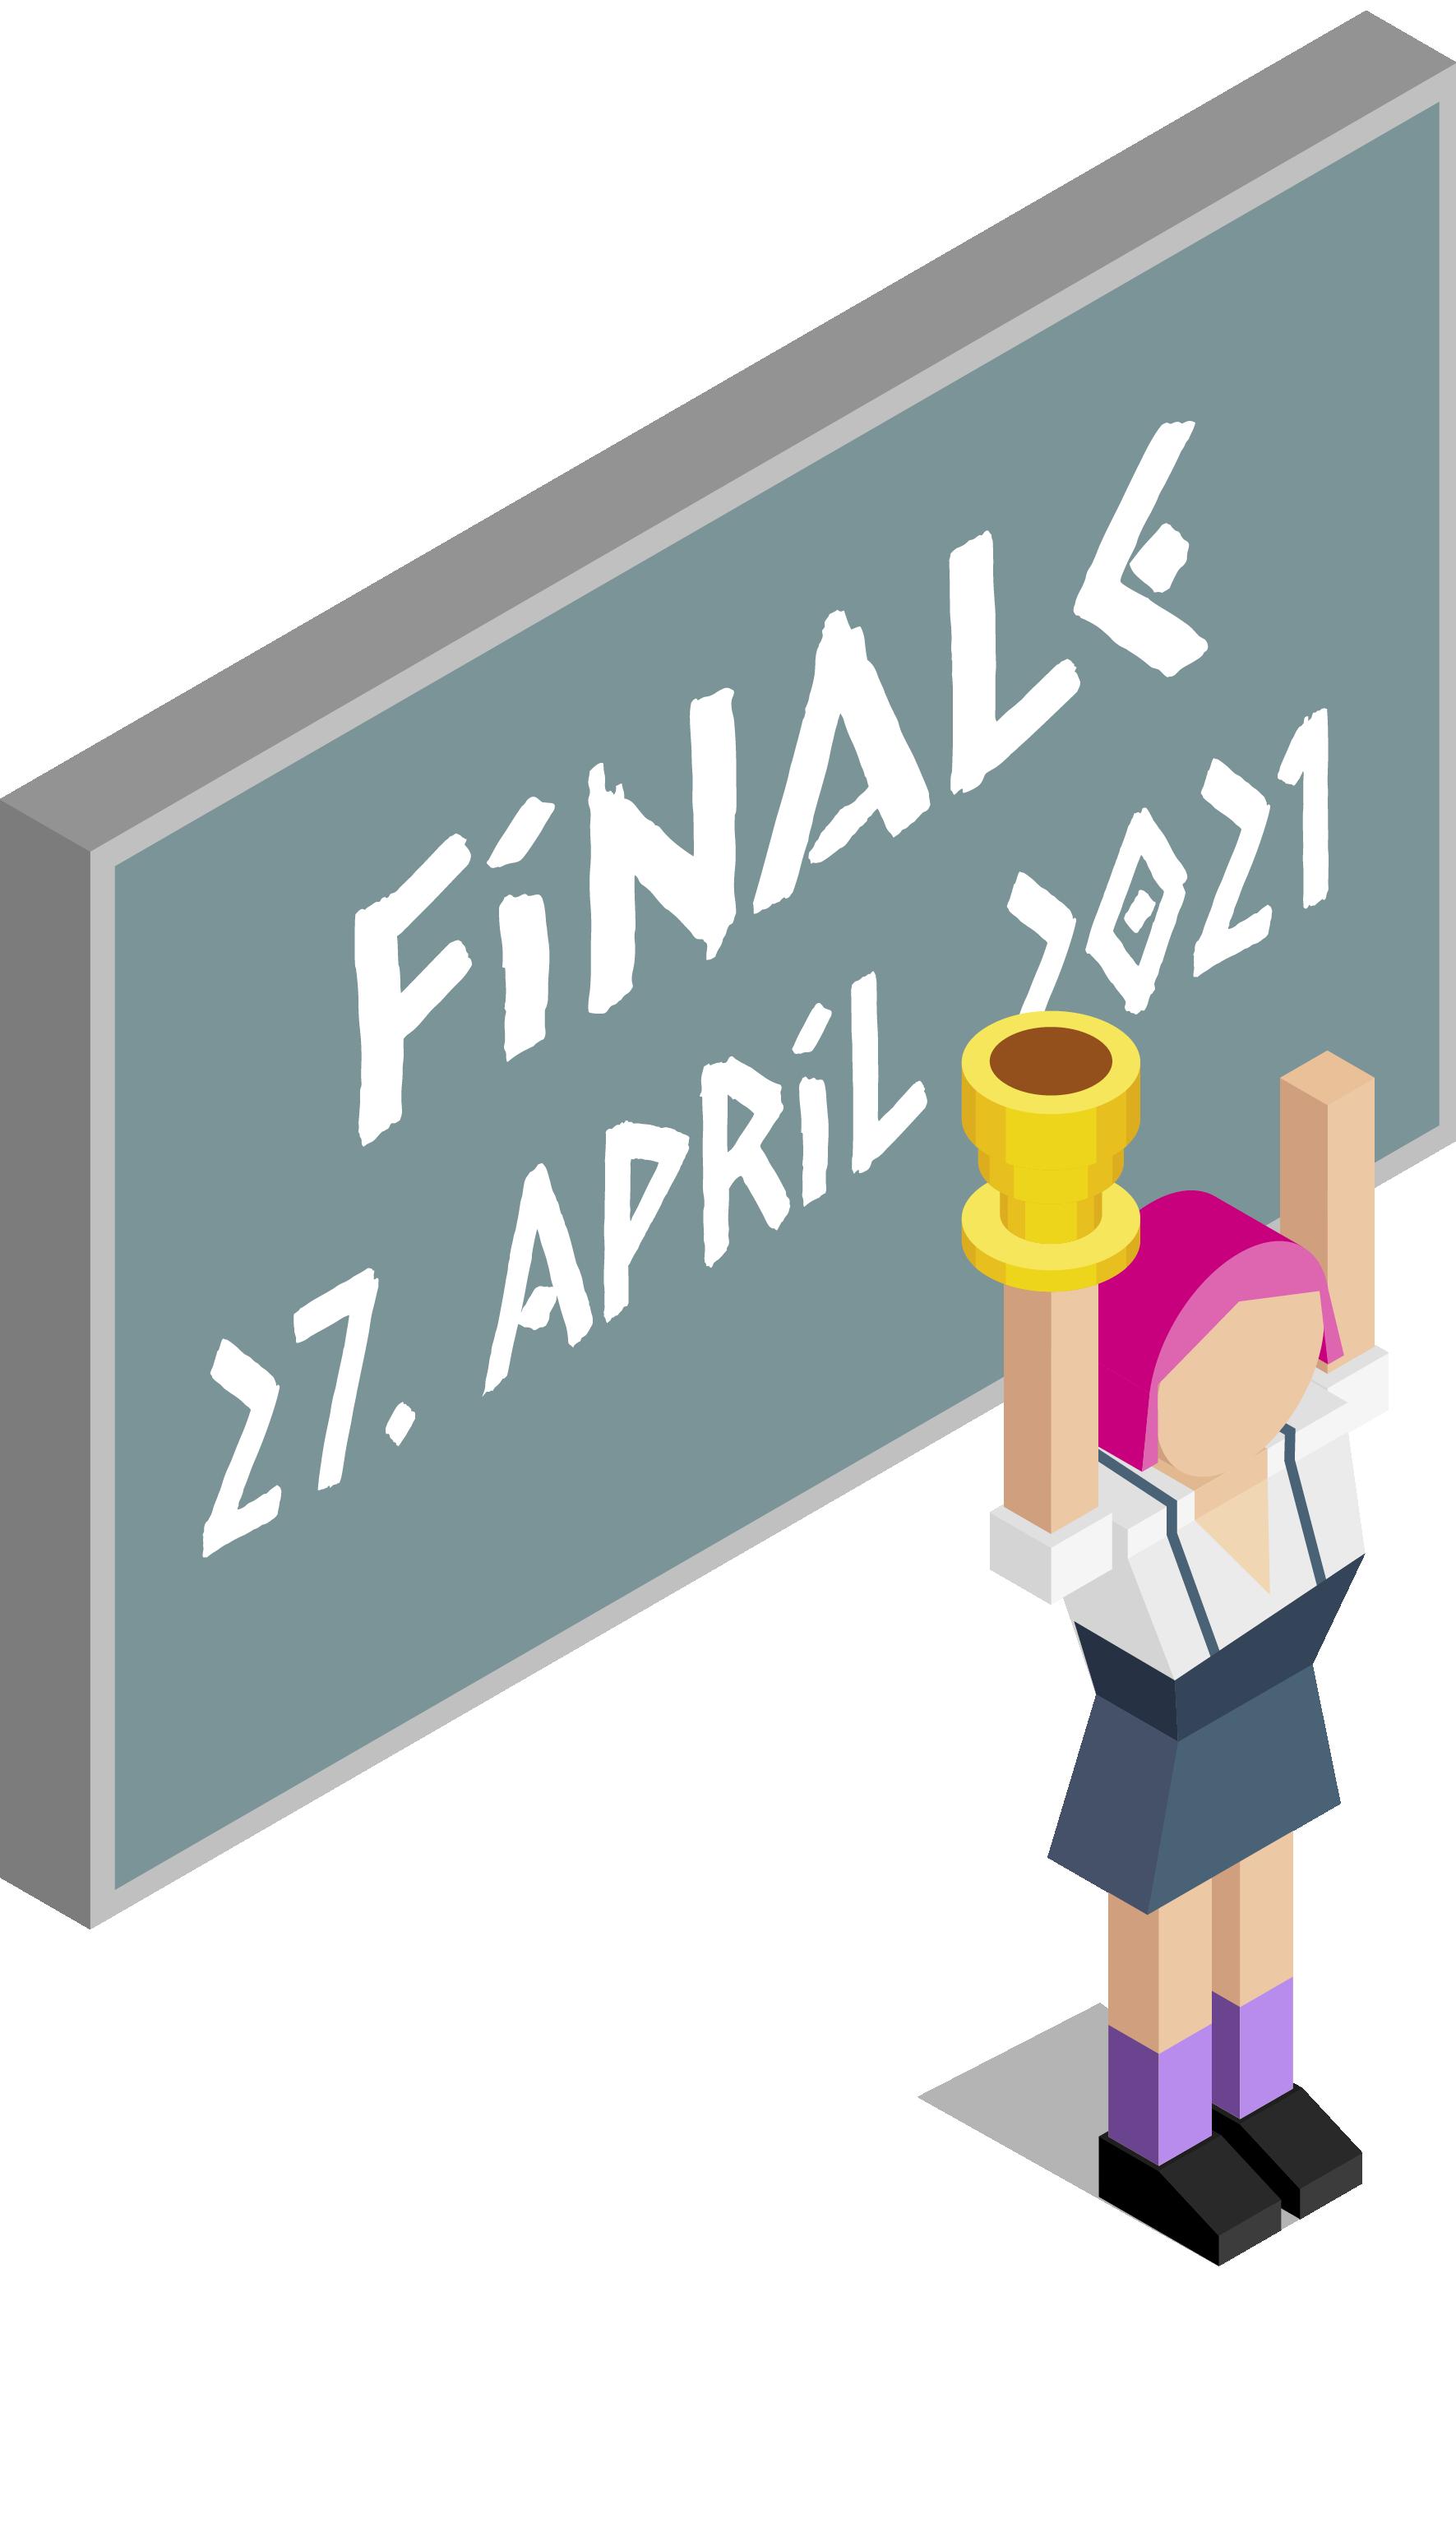 netzwerk-berufswahlsiegel-blog-smartfilmsafari-finale2021